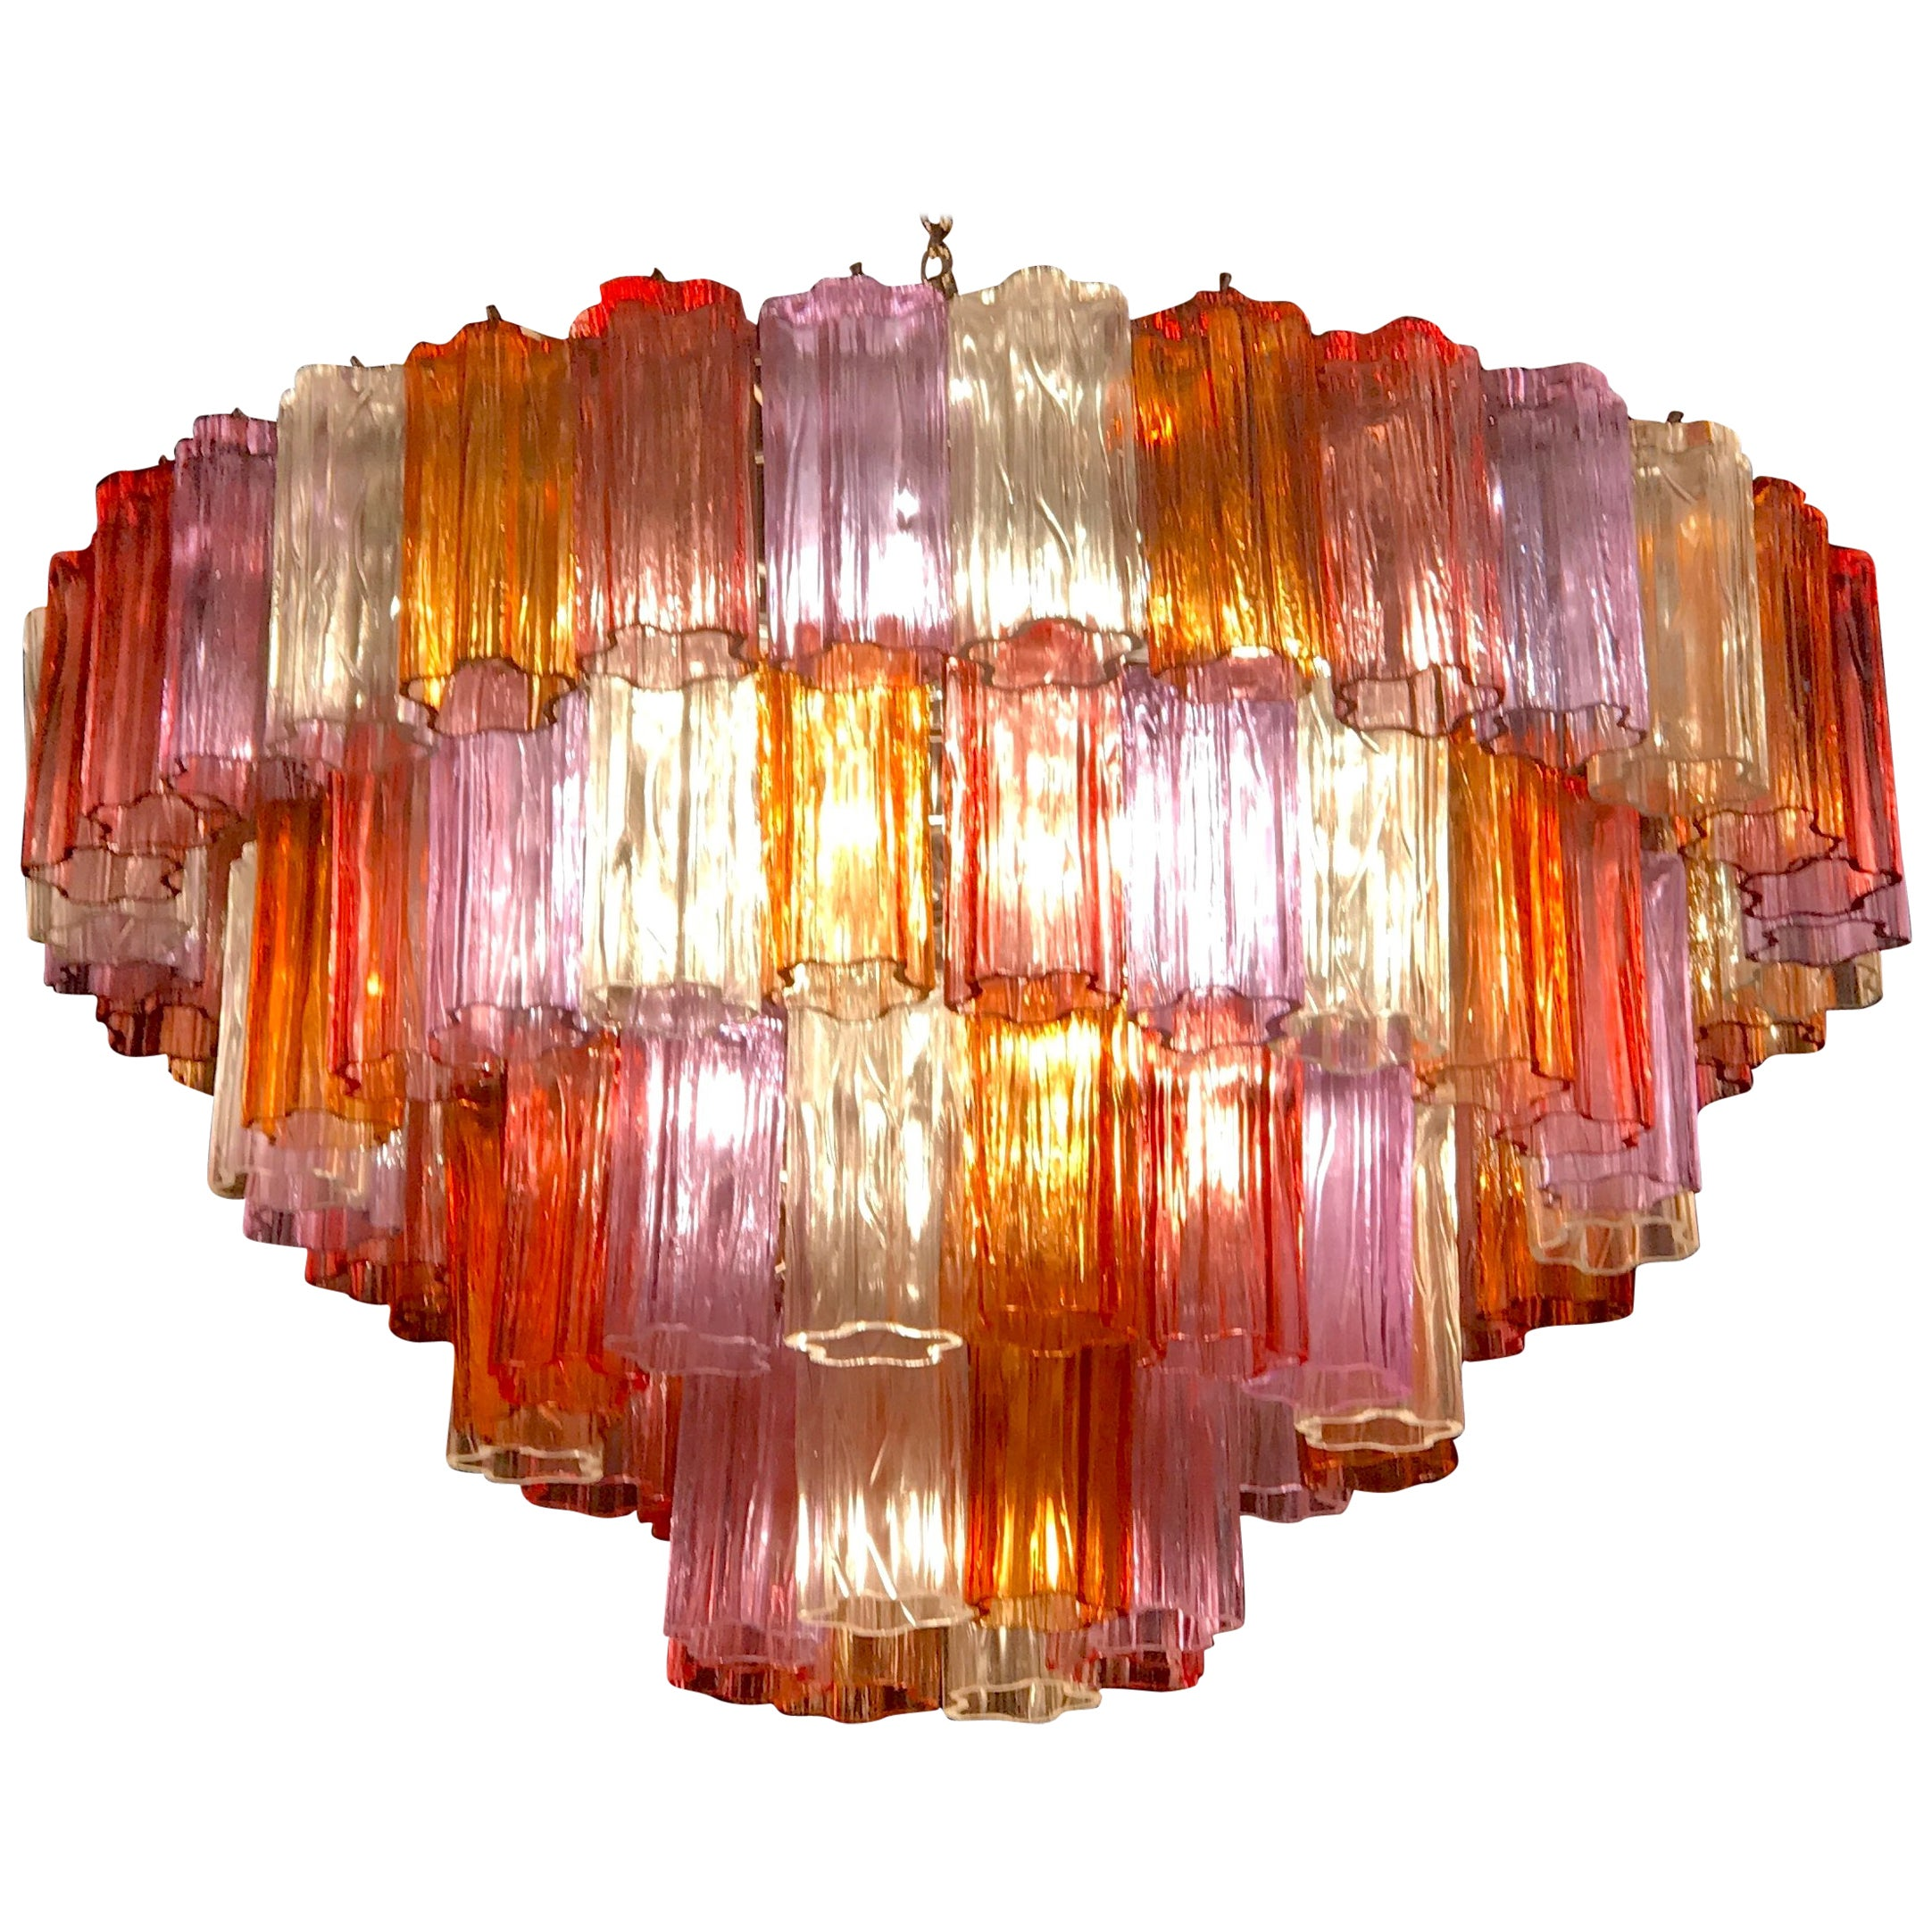 Midcentury Multicolored Murano Glass Chandelier by Zuccheri for Venini